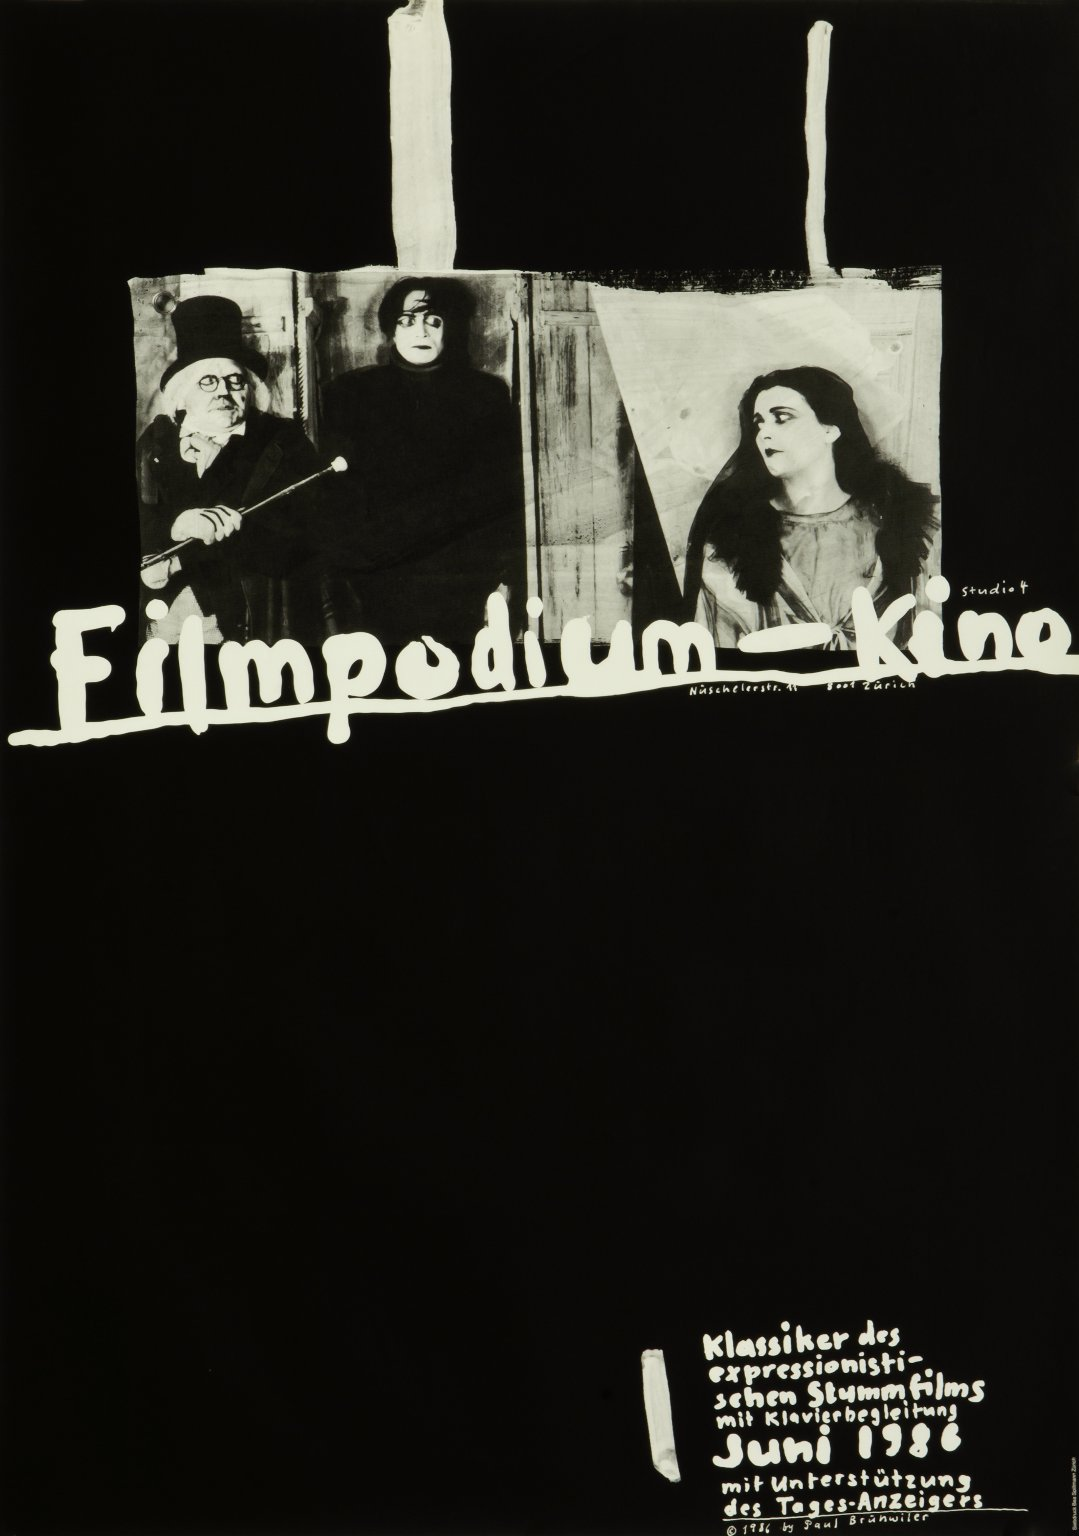 Filmpodium-Kino